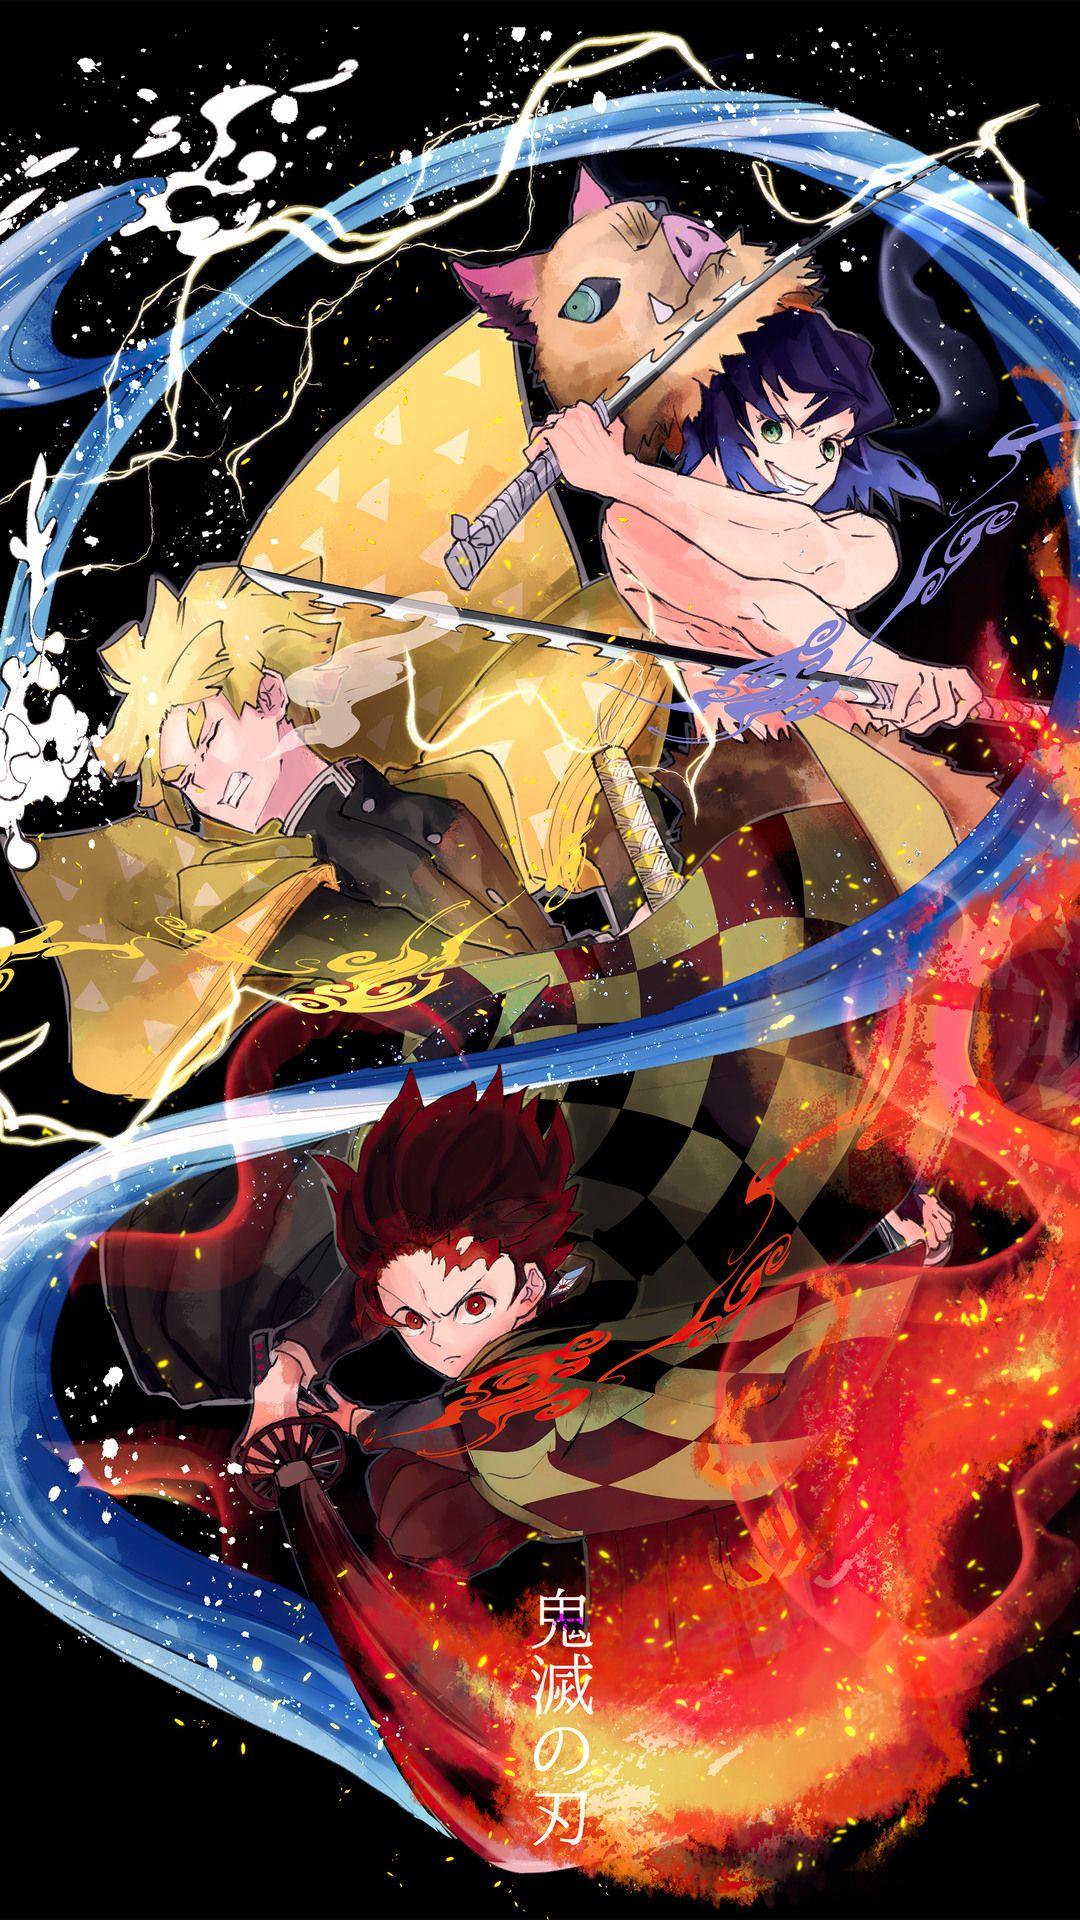 Demon Slayer Mobile Wallpaper Heroscreen Cool Wallpapers In 2021 Anime Anime Wallpaper Awesome Anime Demon slayer anime phone wallpaper